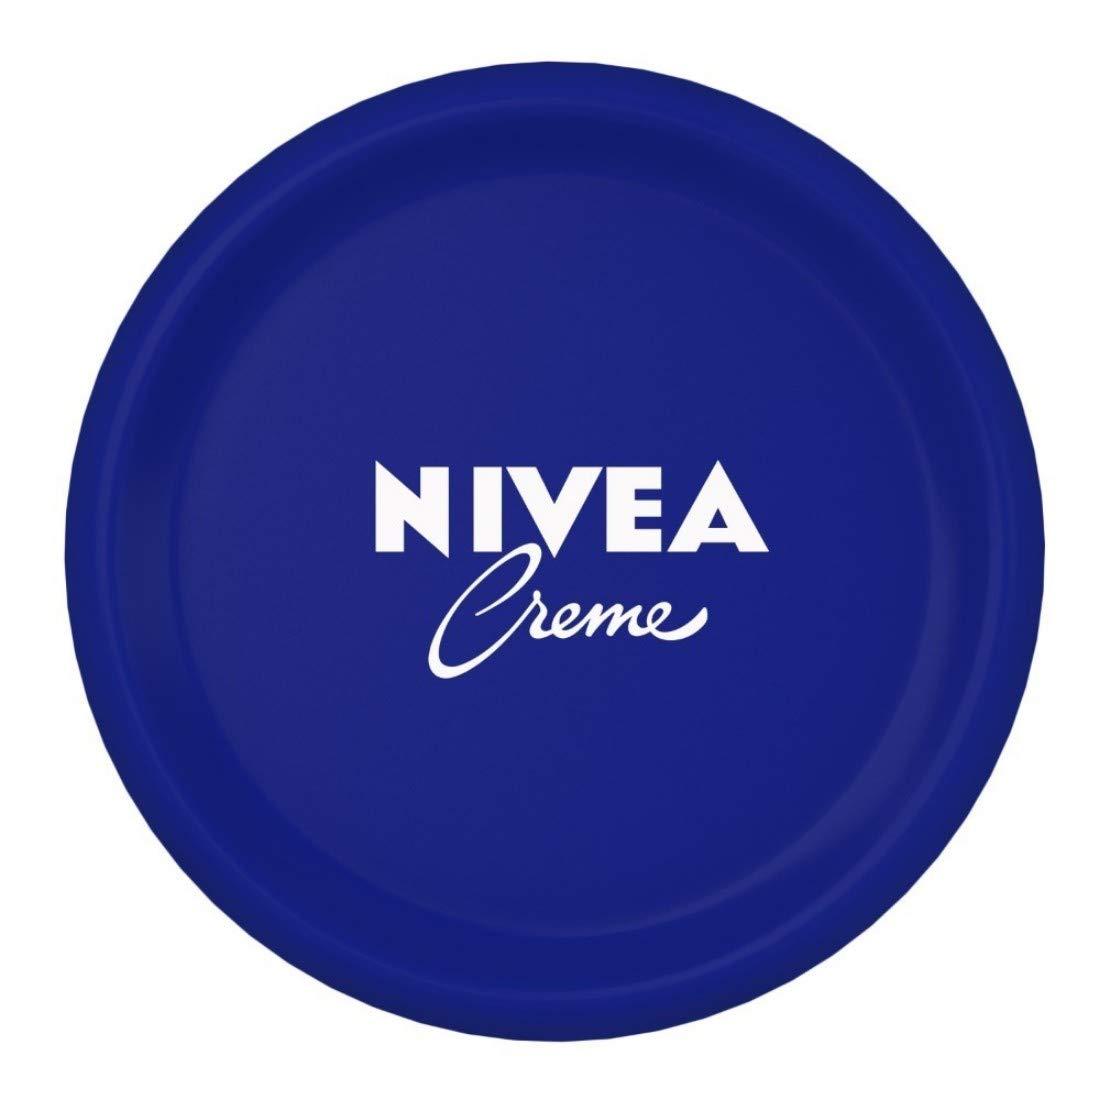 NIVEA Creme, Multi Purpose Cream, 200ml product image